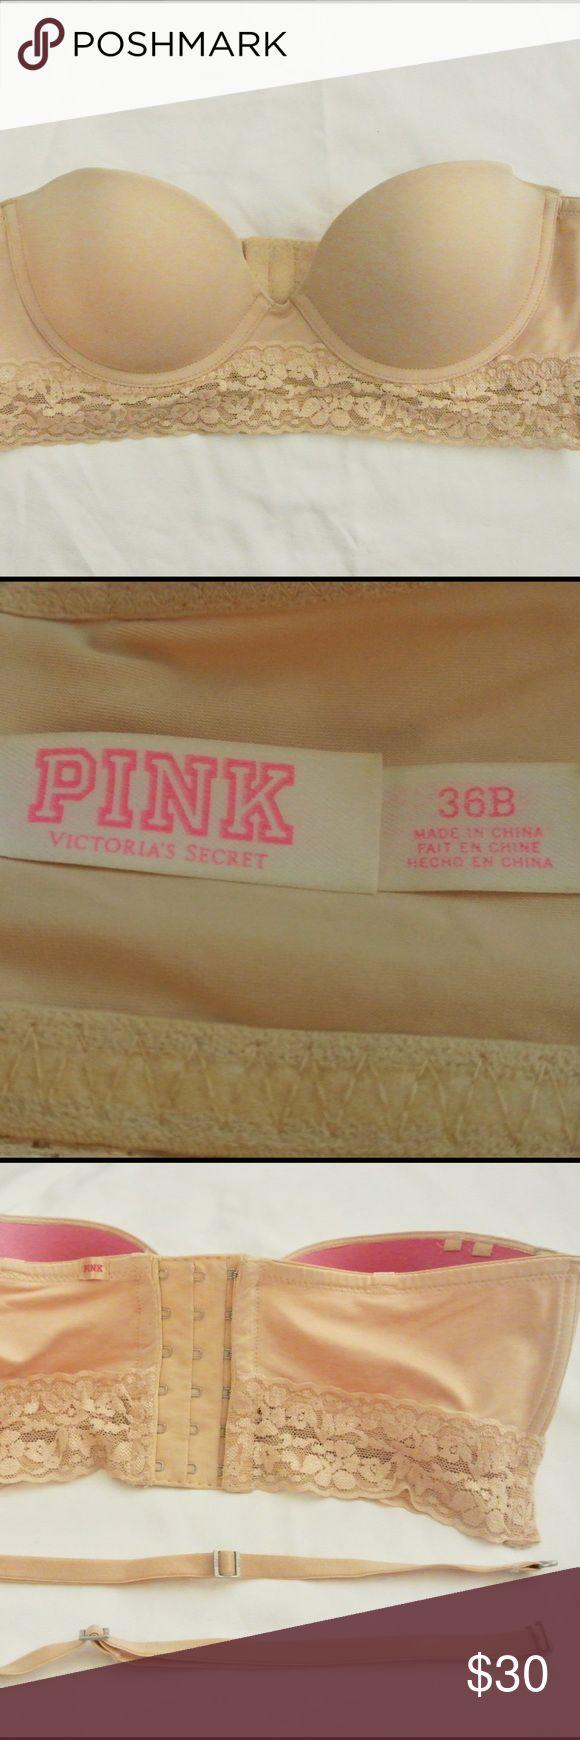 36B PINK Corset bra 36B PINK strapless corset bra with removable straps PINK Victoria's Secret Intimates & Sleepwear Bras